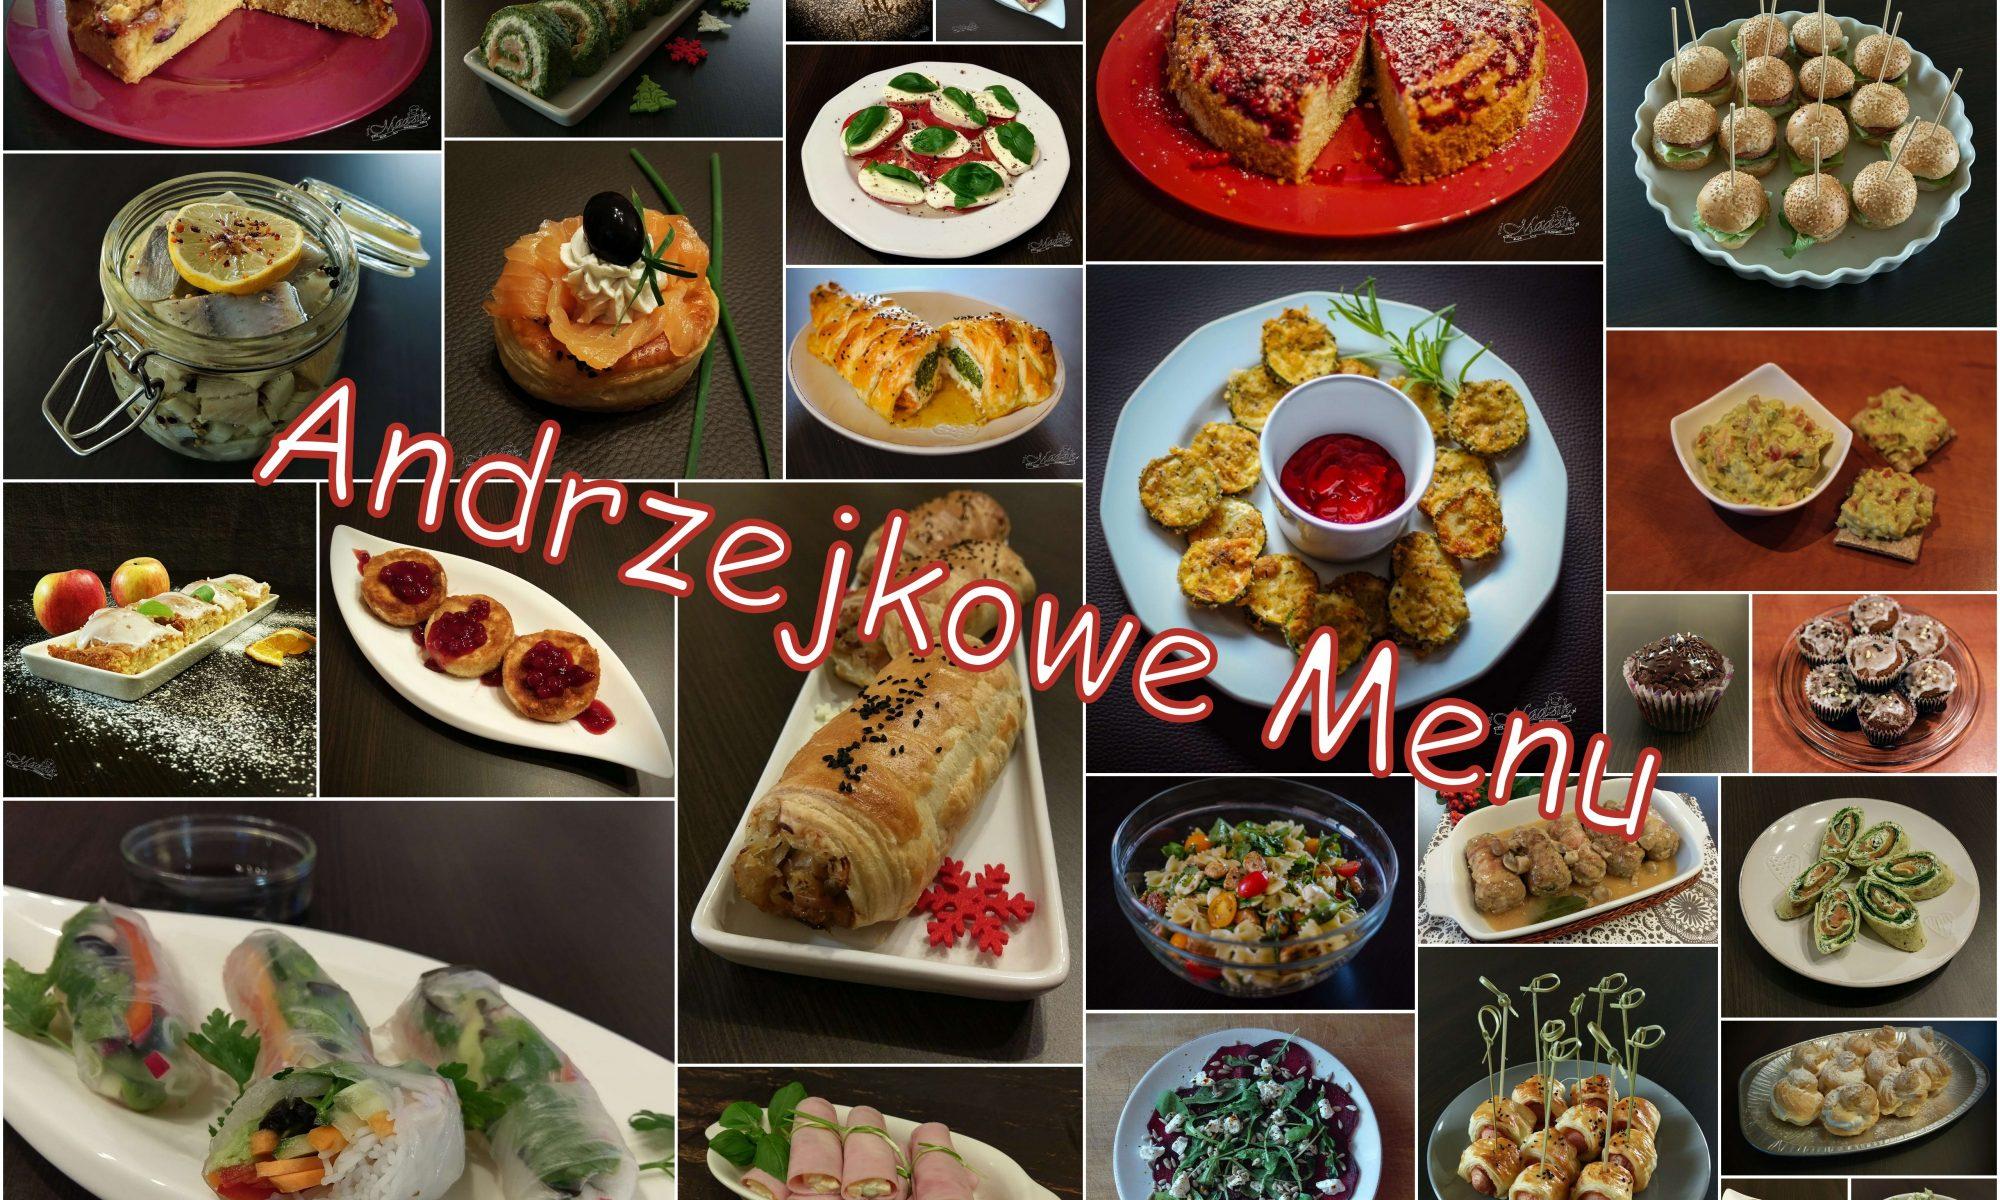 Andrzejkowe menu